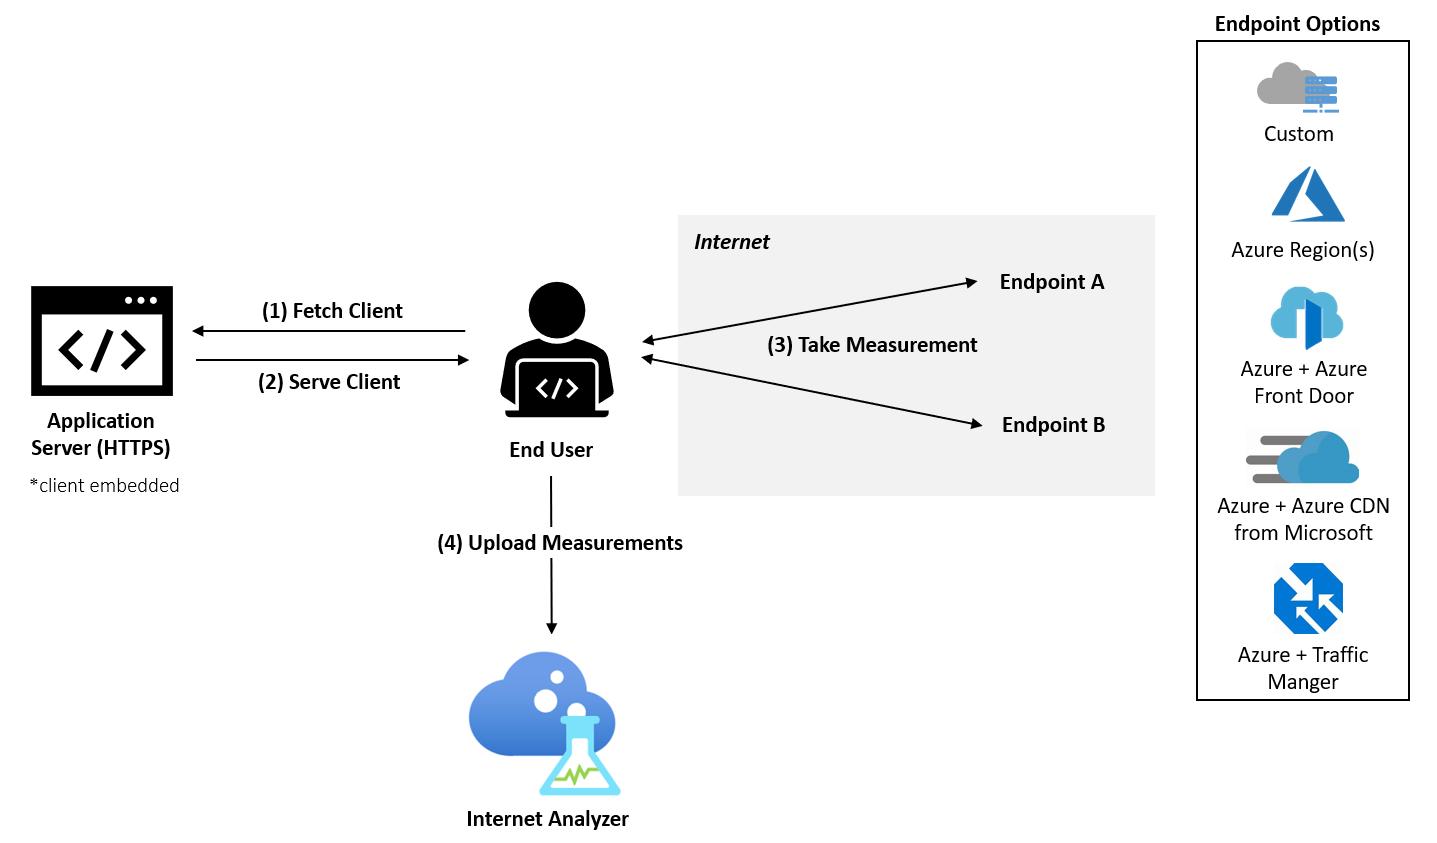 Azure Internet Analyzer